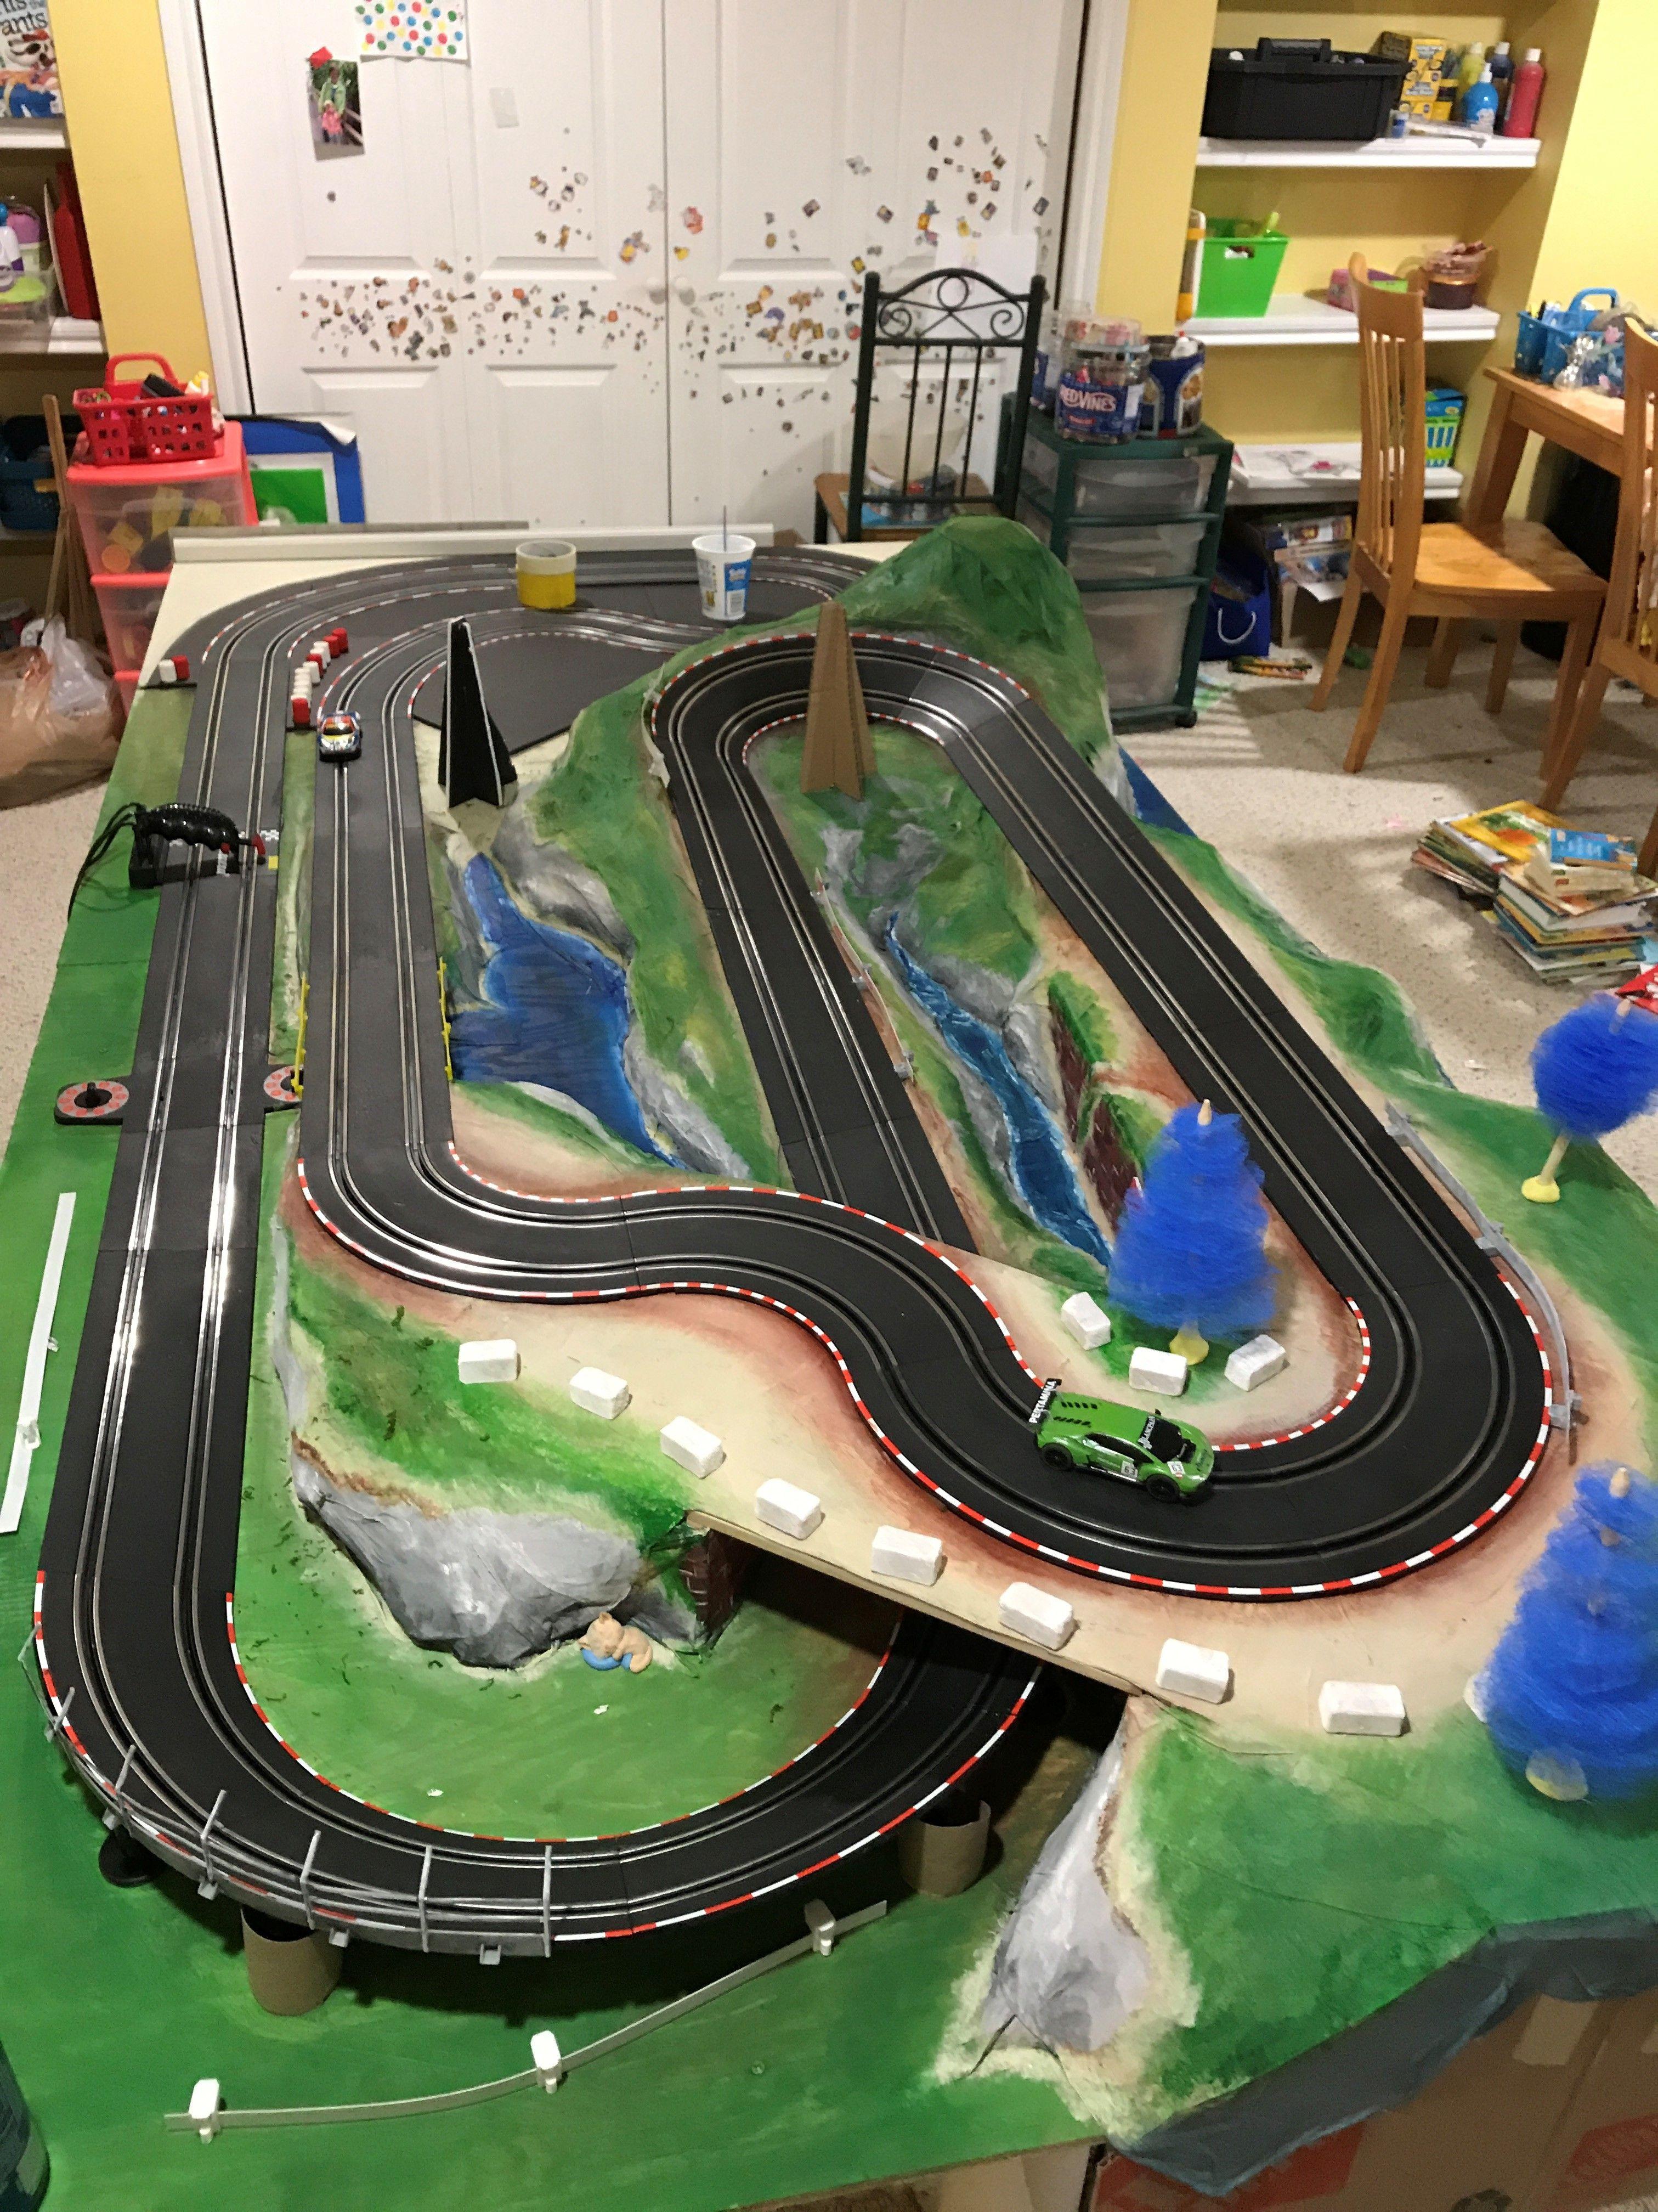 Carrera Go 1 43 Slot Car Layout Slot Cars Car Layout Slot Car Tracks